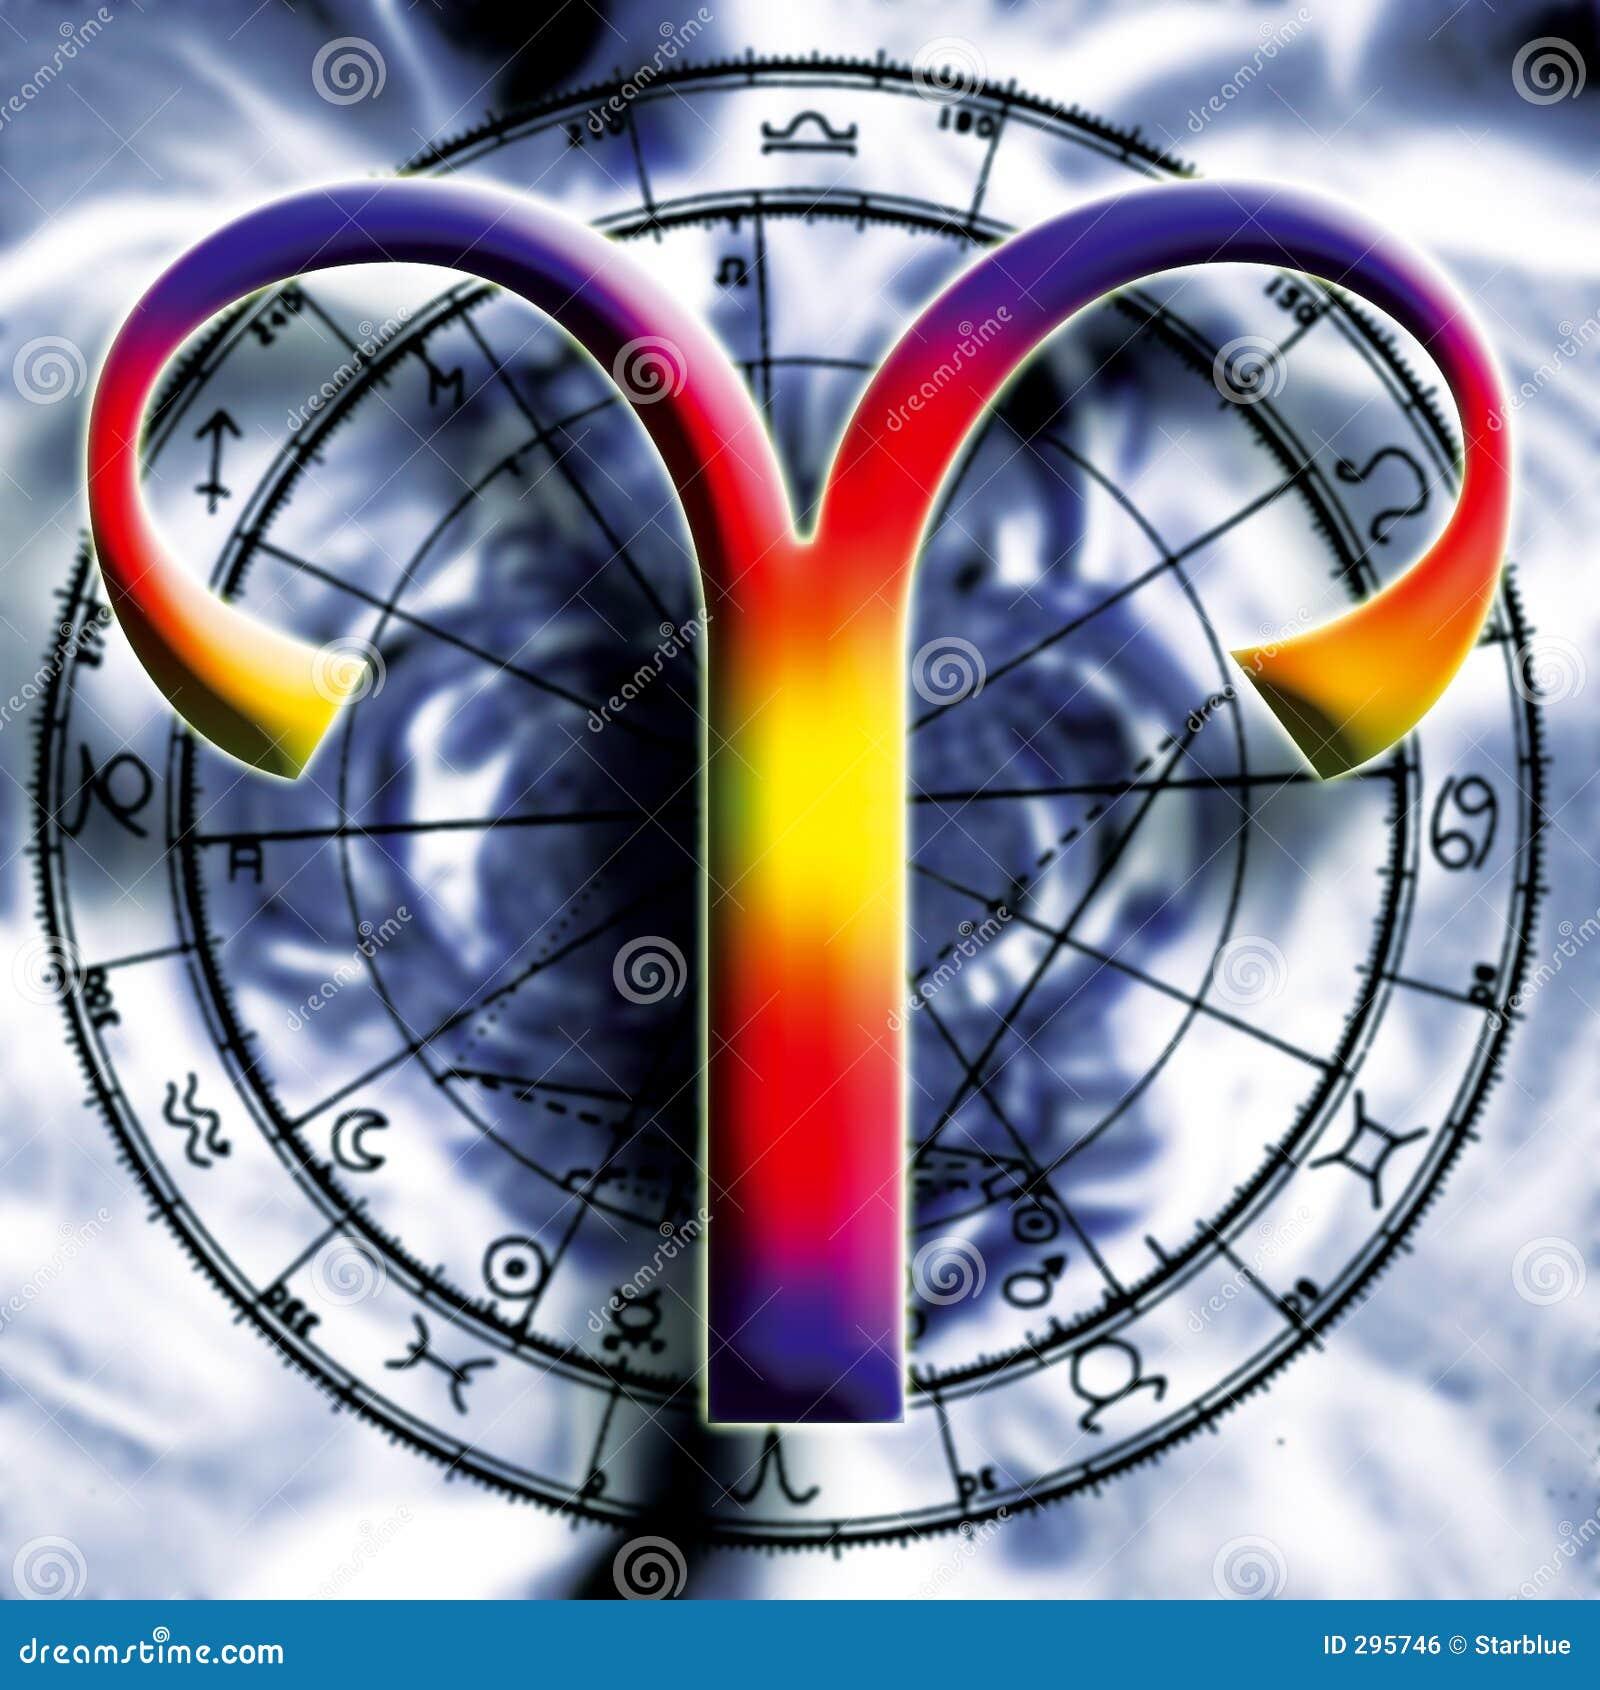 Astrology: aries